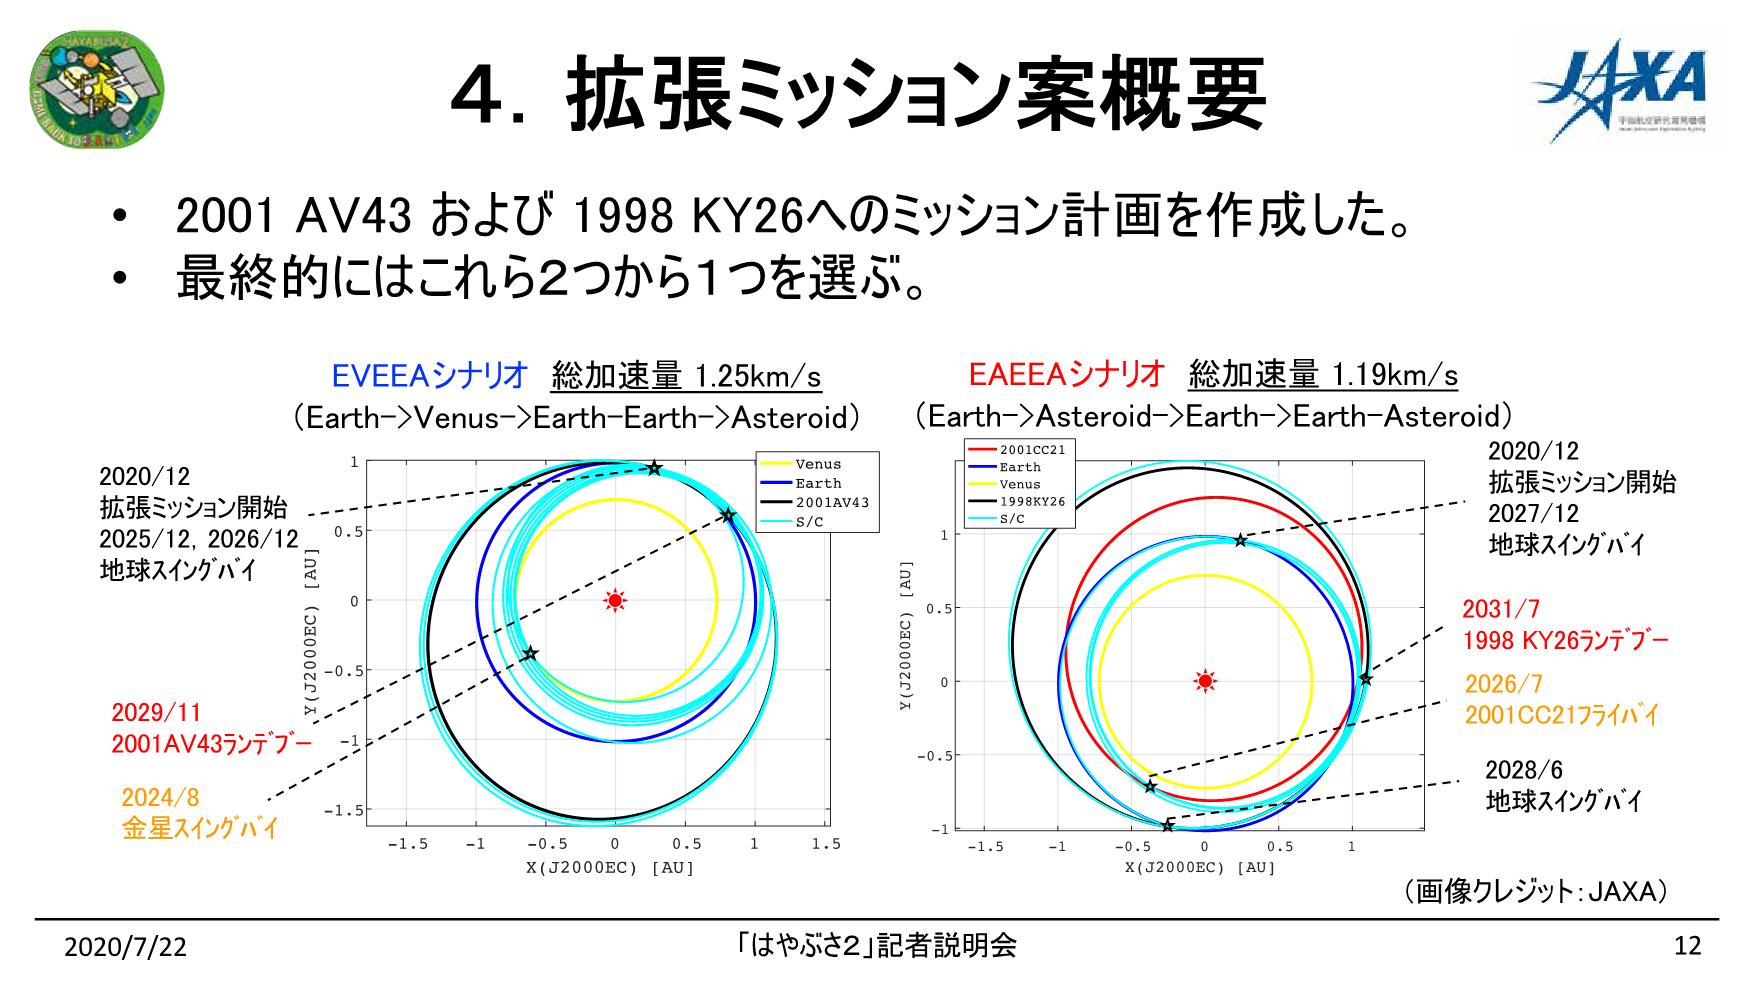 f:id:Imamura:20200722140721p:plain